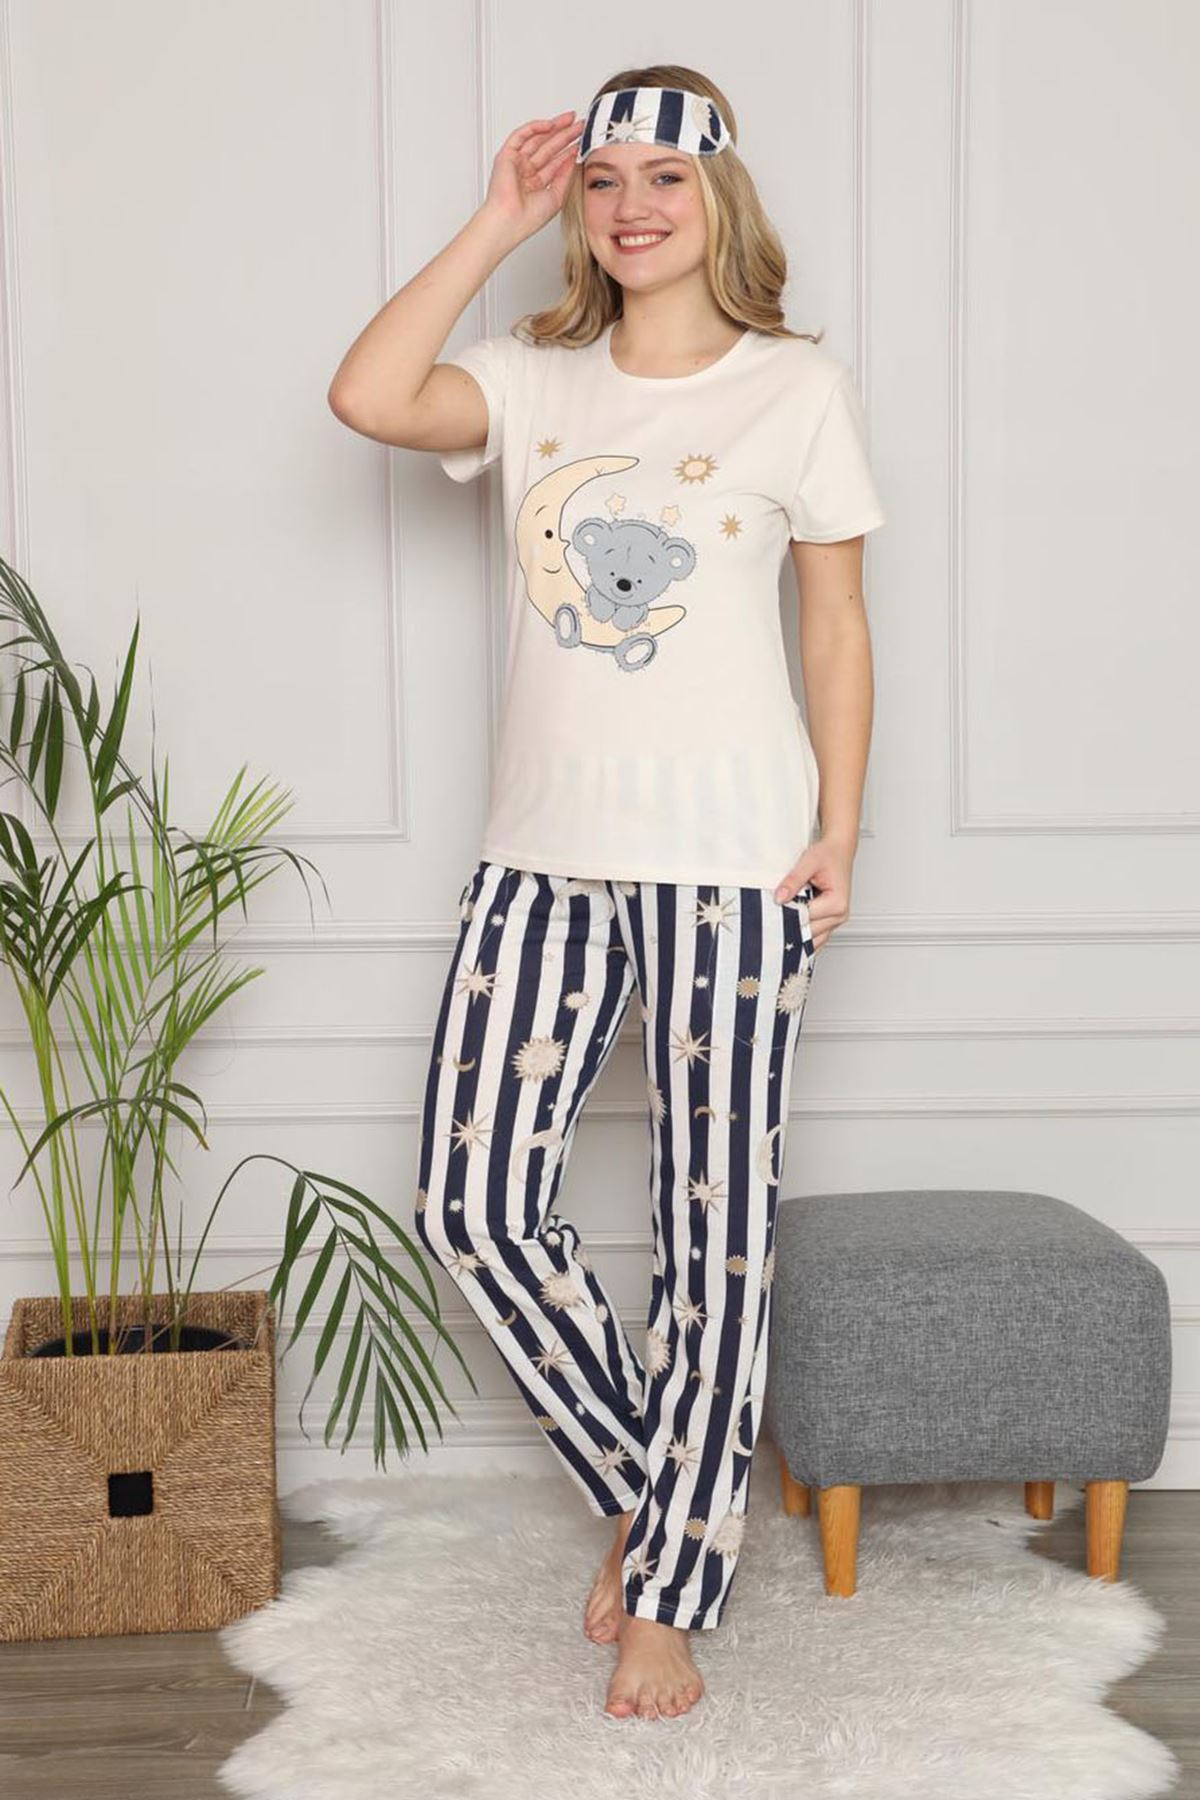 Kadın Krem Çizgili Kısa Kol Pijama Takımı 3E-2539L